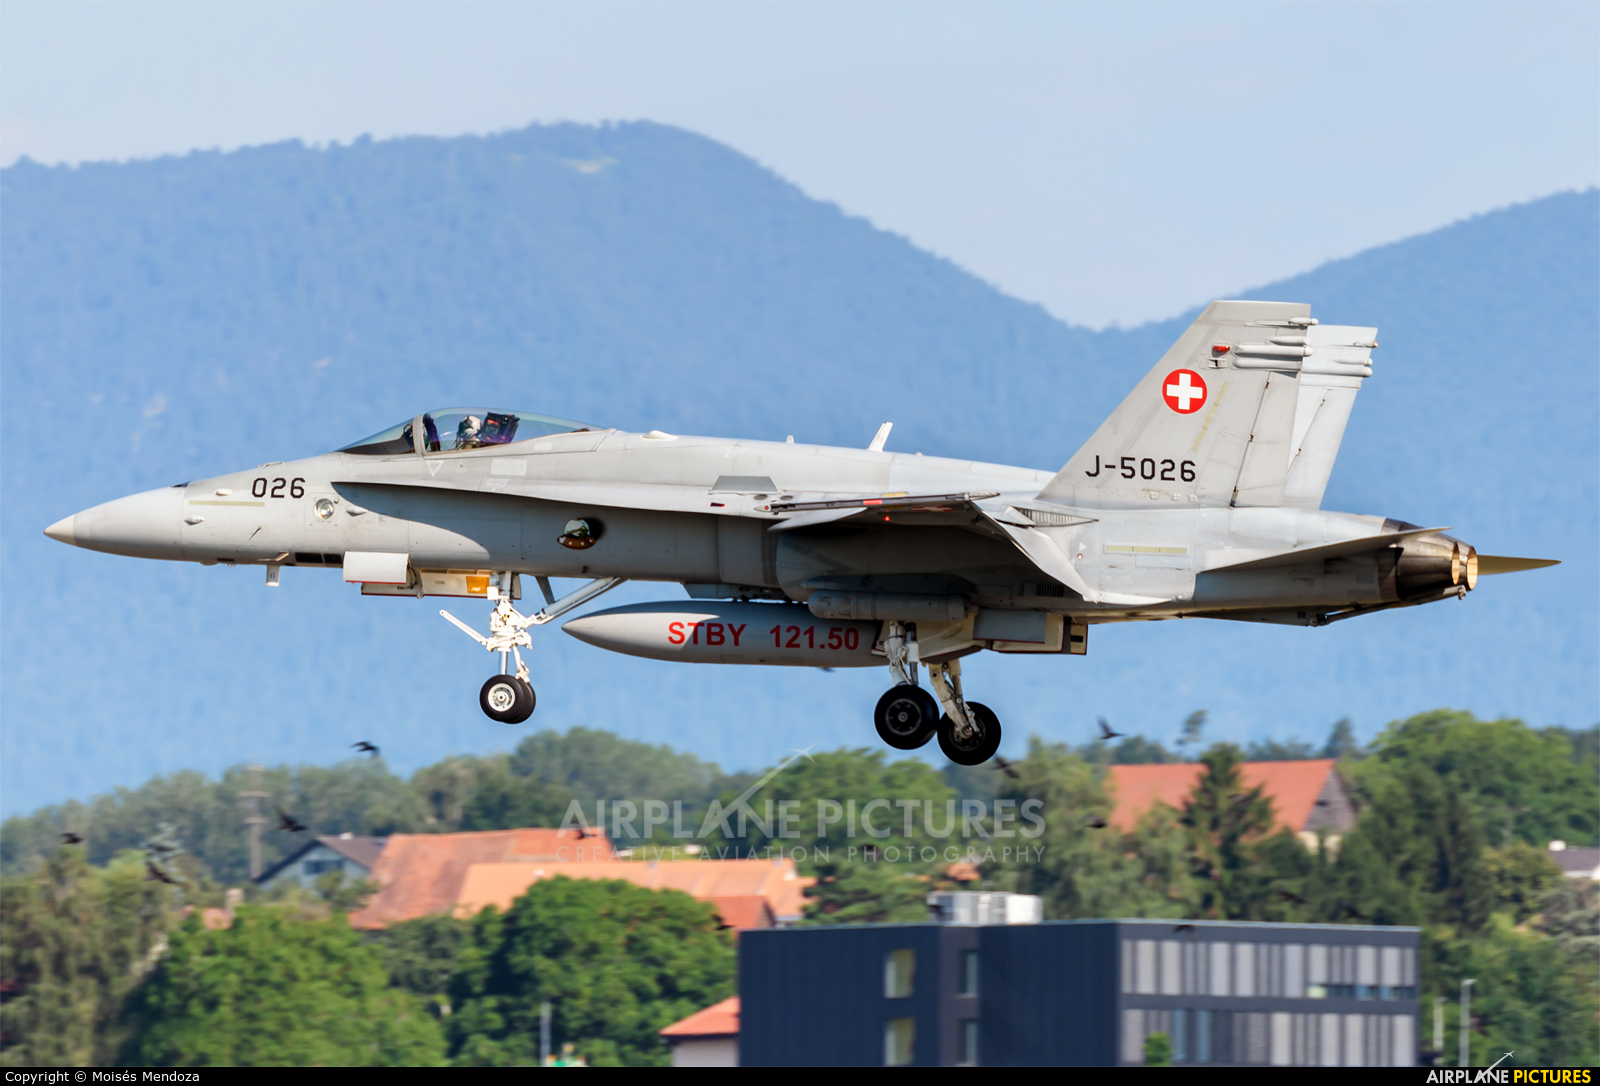 Switzerland - Air Force J-5026 aircraft at Payerne